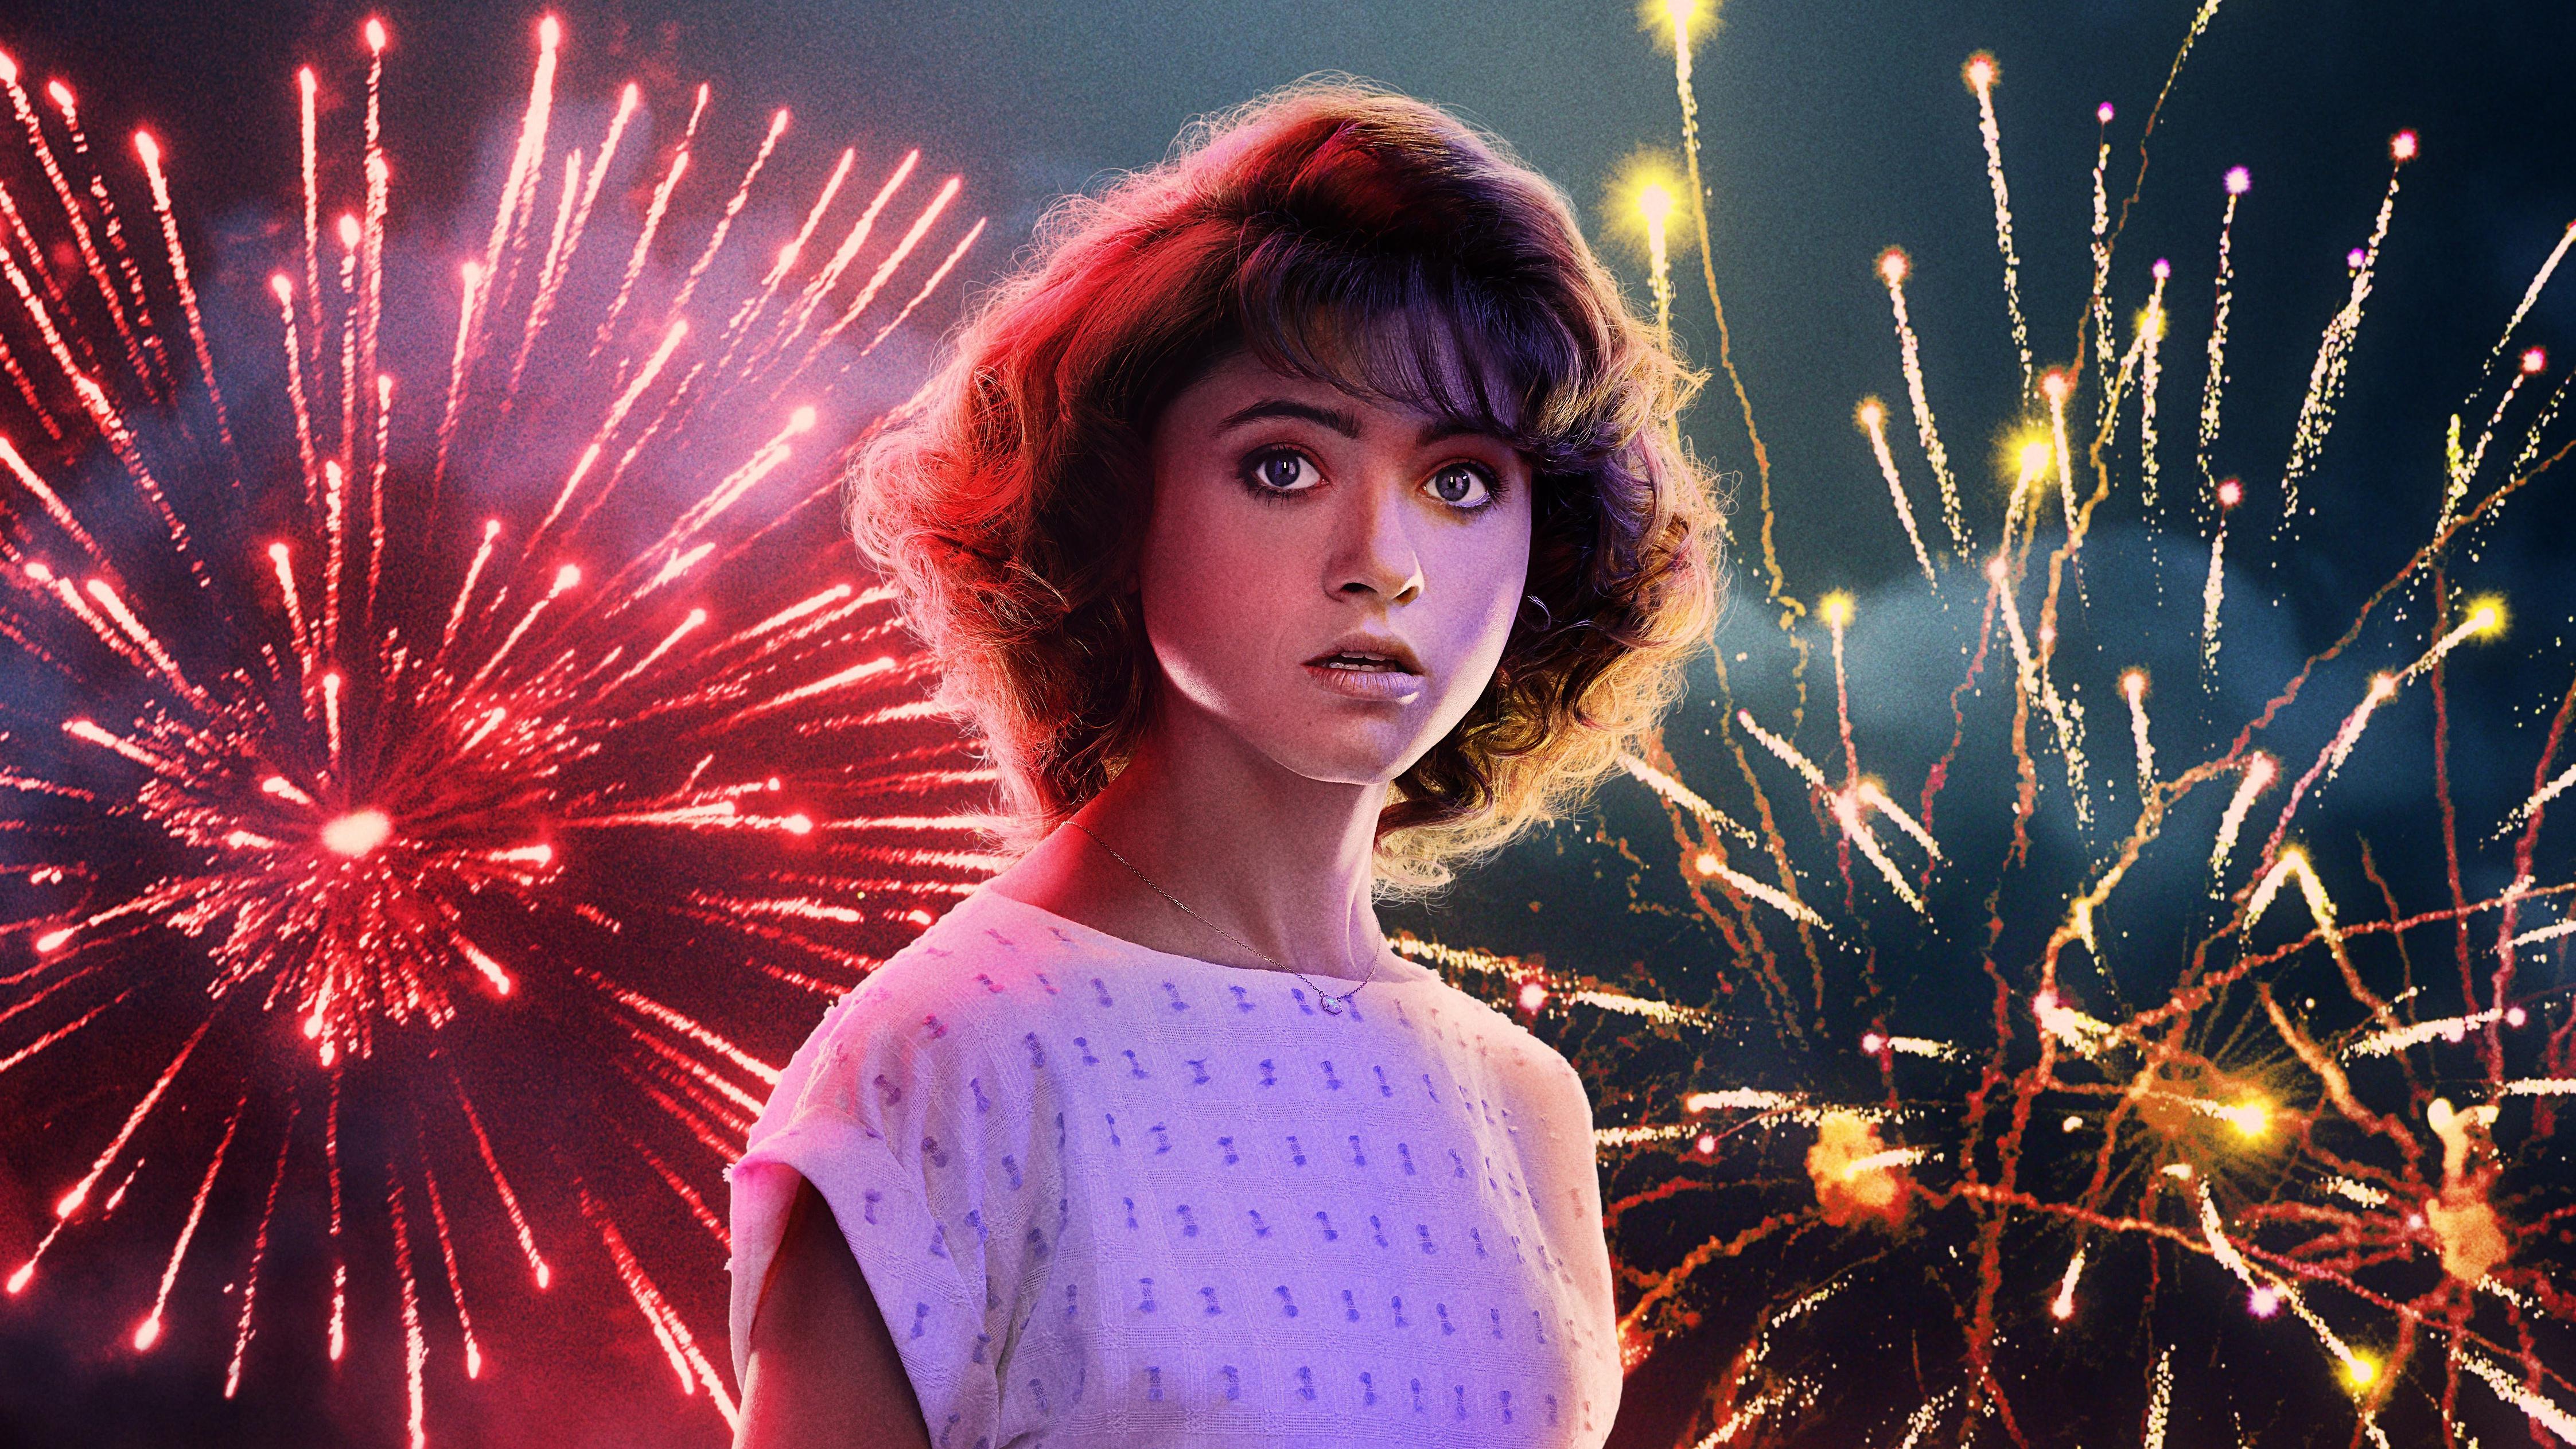 Nancy In Stranger Things Season 3 2019 5k Hd Tv Shows 4k